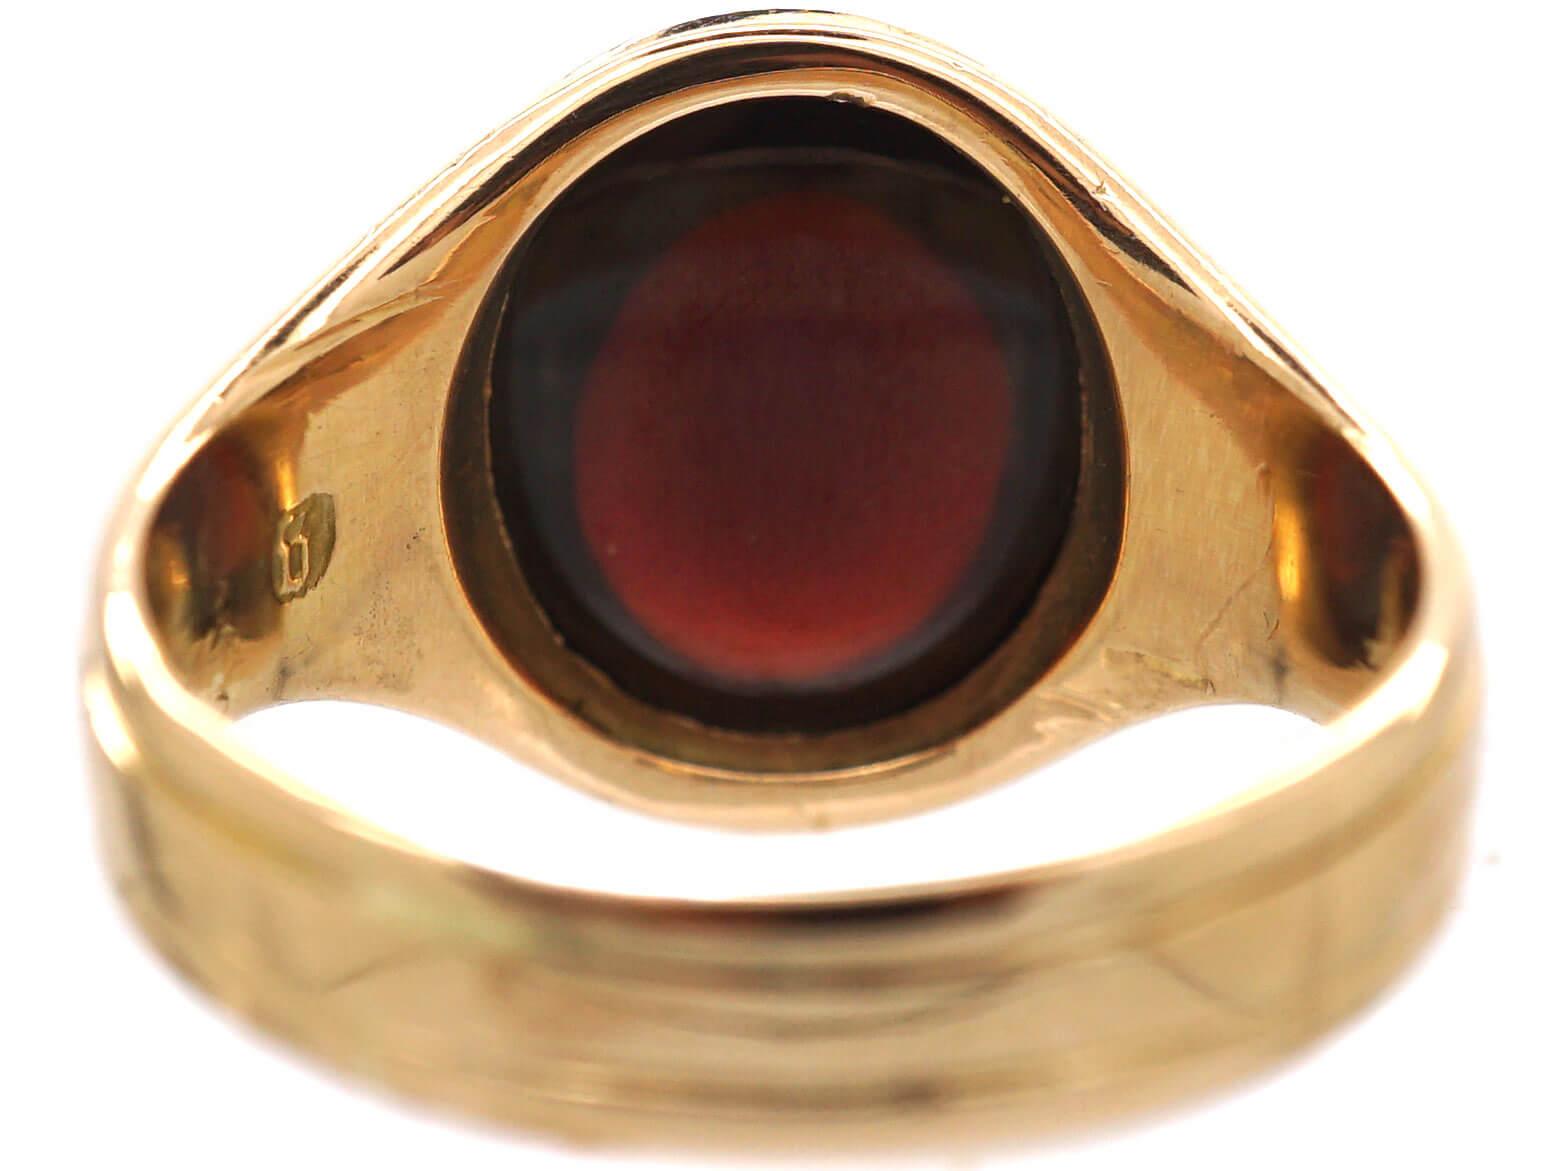 Victorian 15ct Gold & Cabochon Garnet Ring